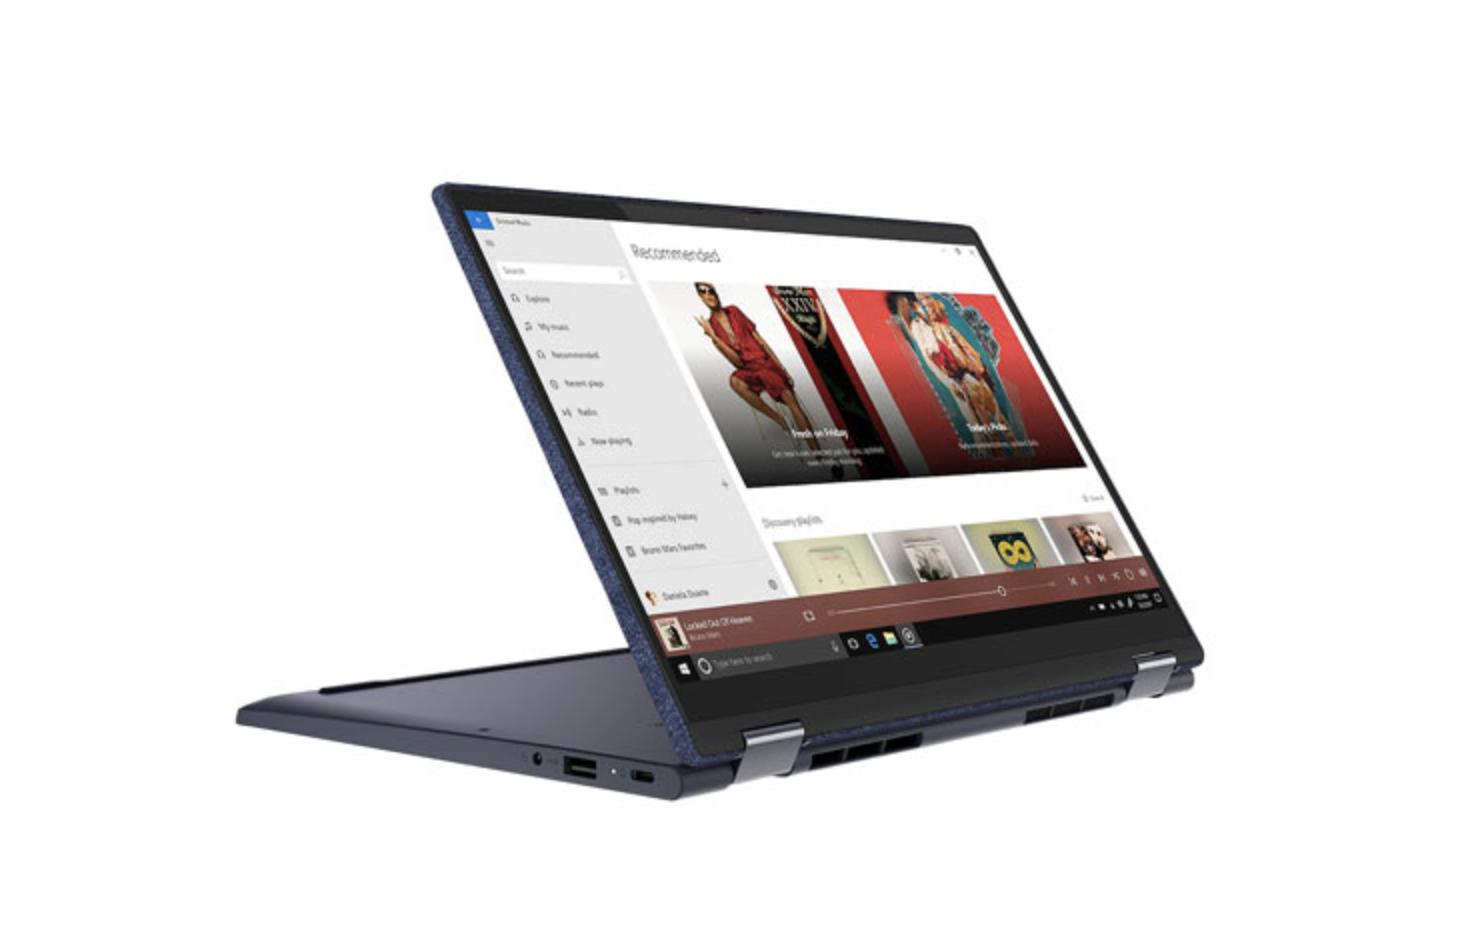 "Lenovo Yoga 6 13.3"" touchscreen 2-in-1 laptop with AMD Ryzen 5 processor"